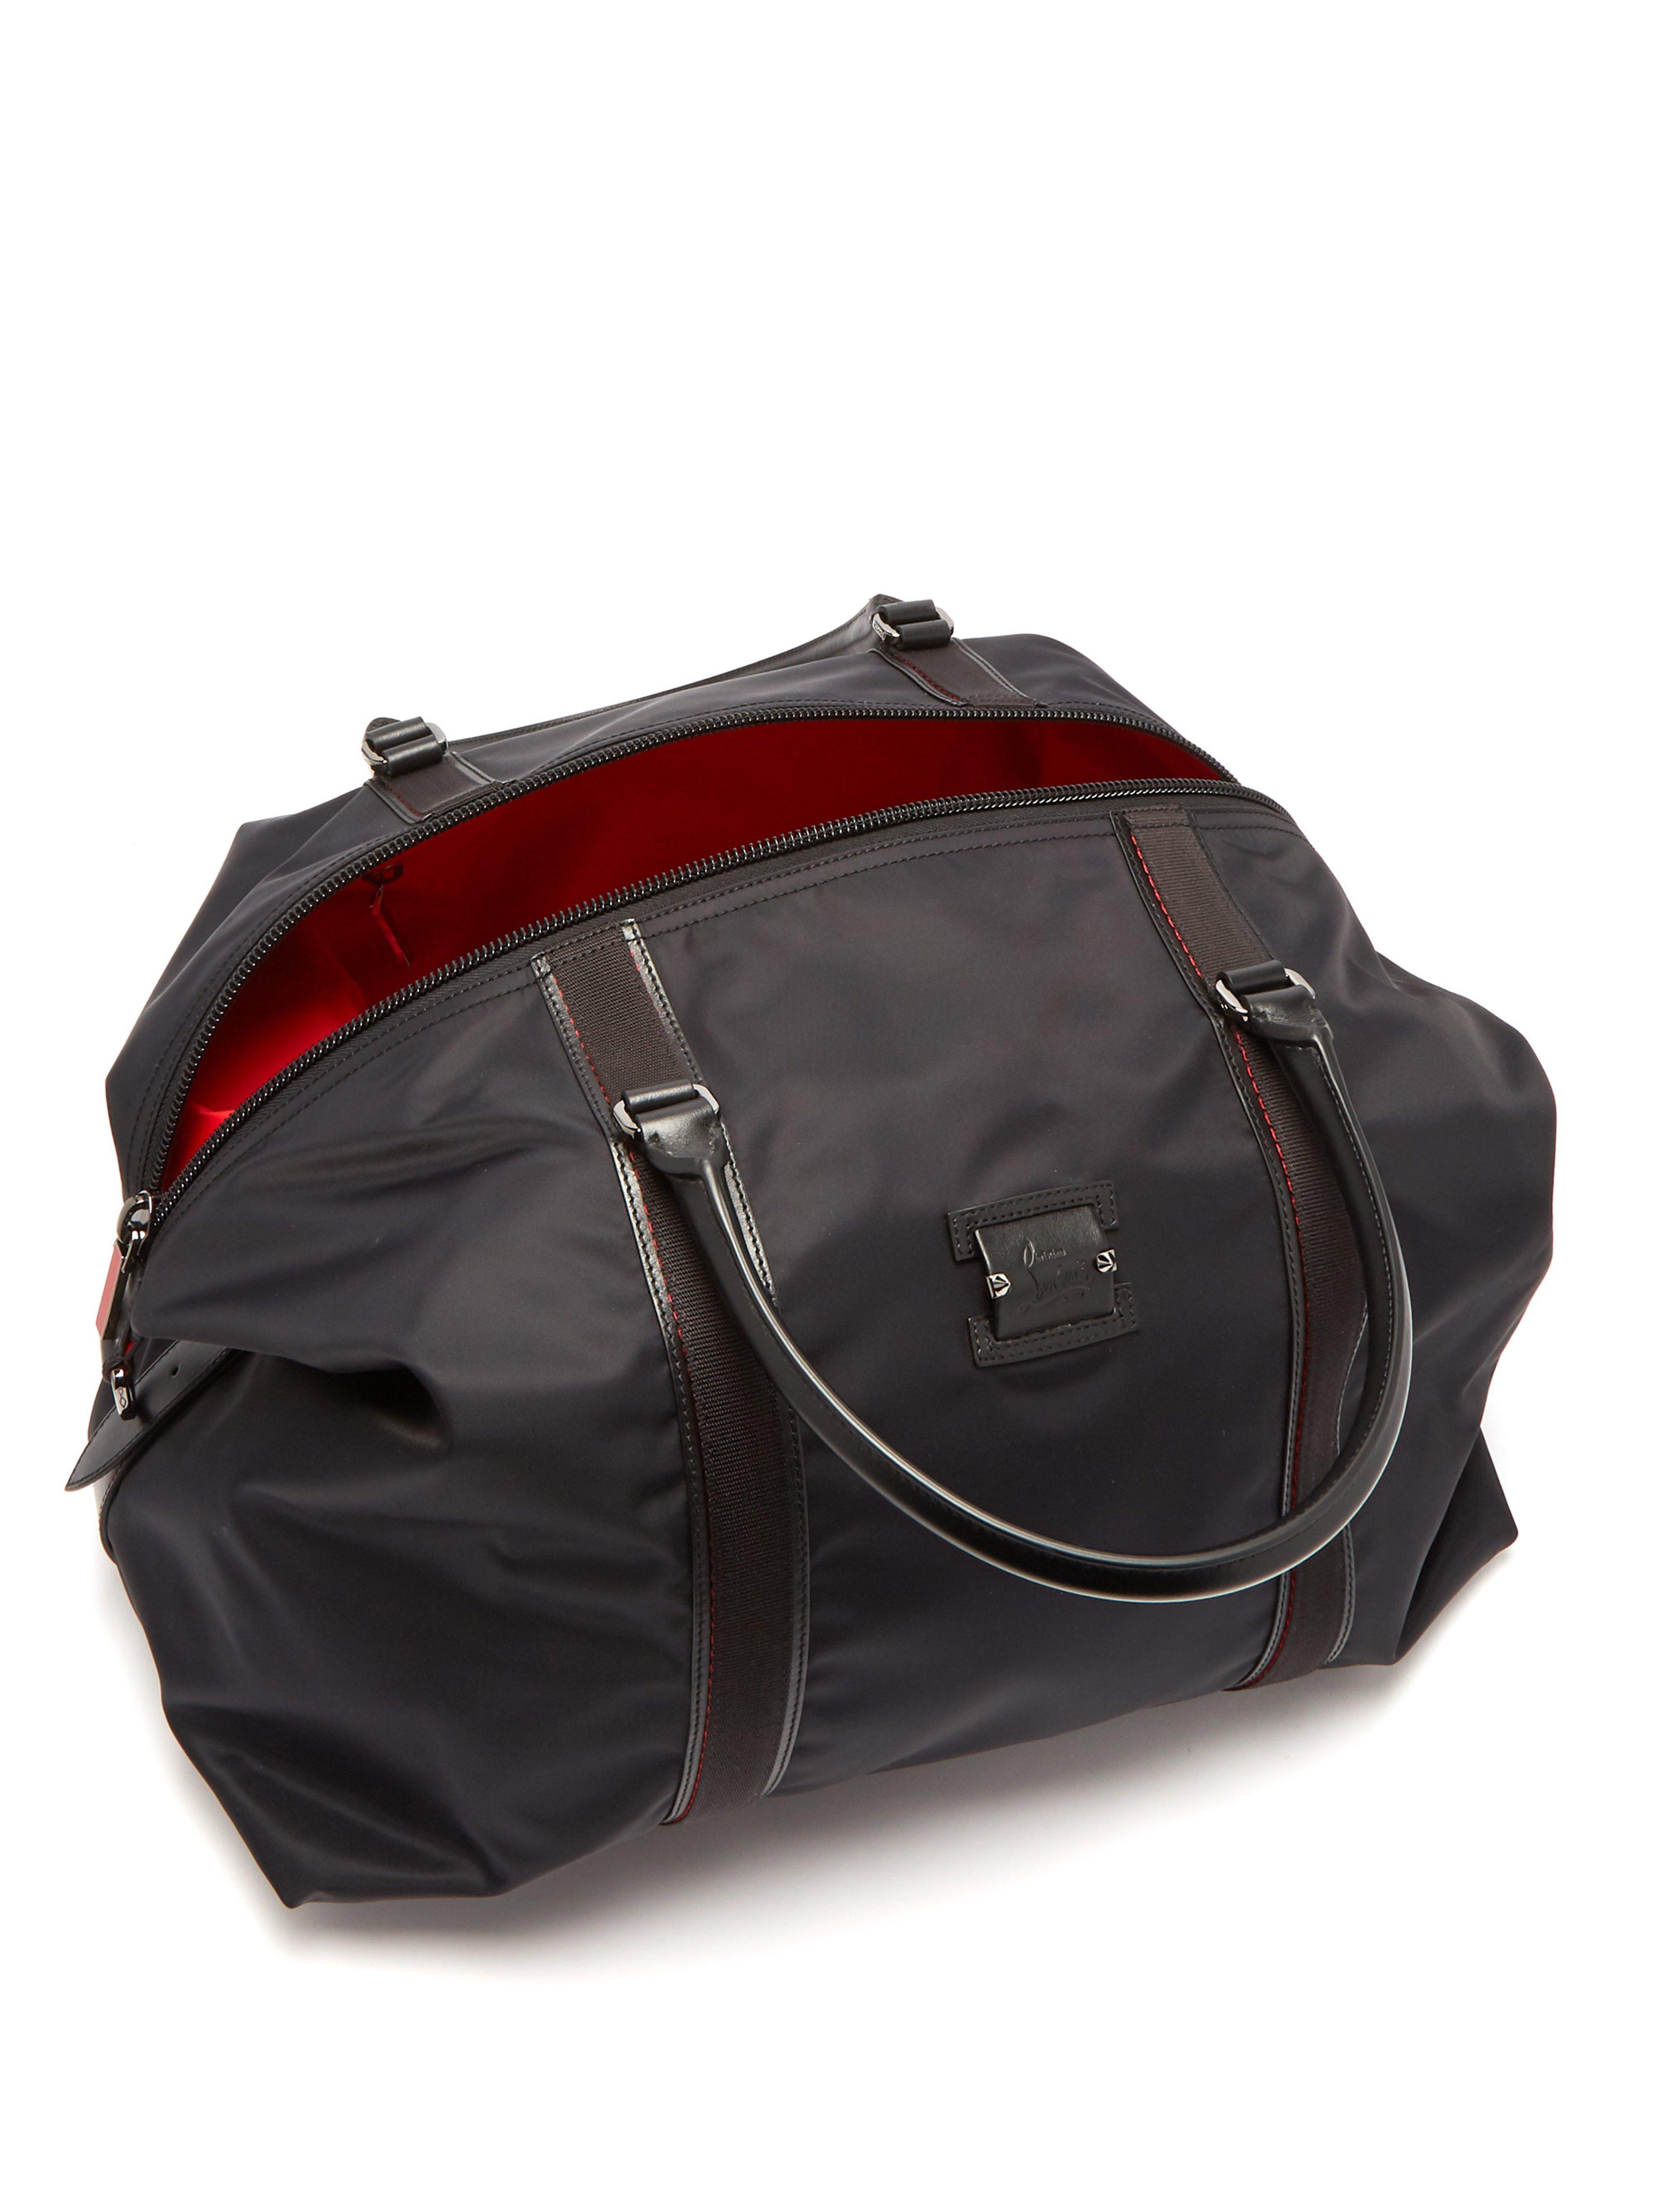 dd4dfbd2aa85 Christian Louboutin Parislisboa Double Handle Weekend Bag in Black for Men  - Lyst